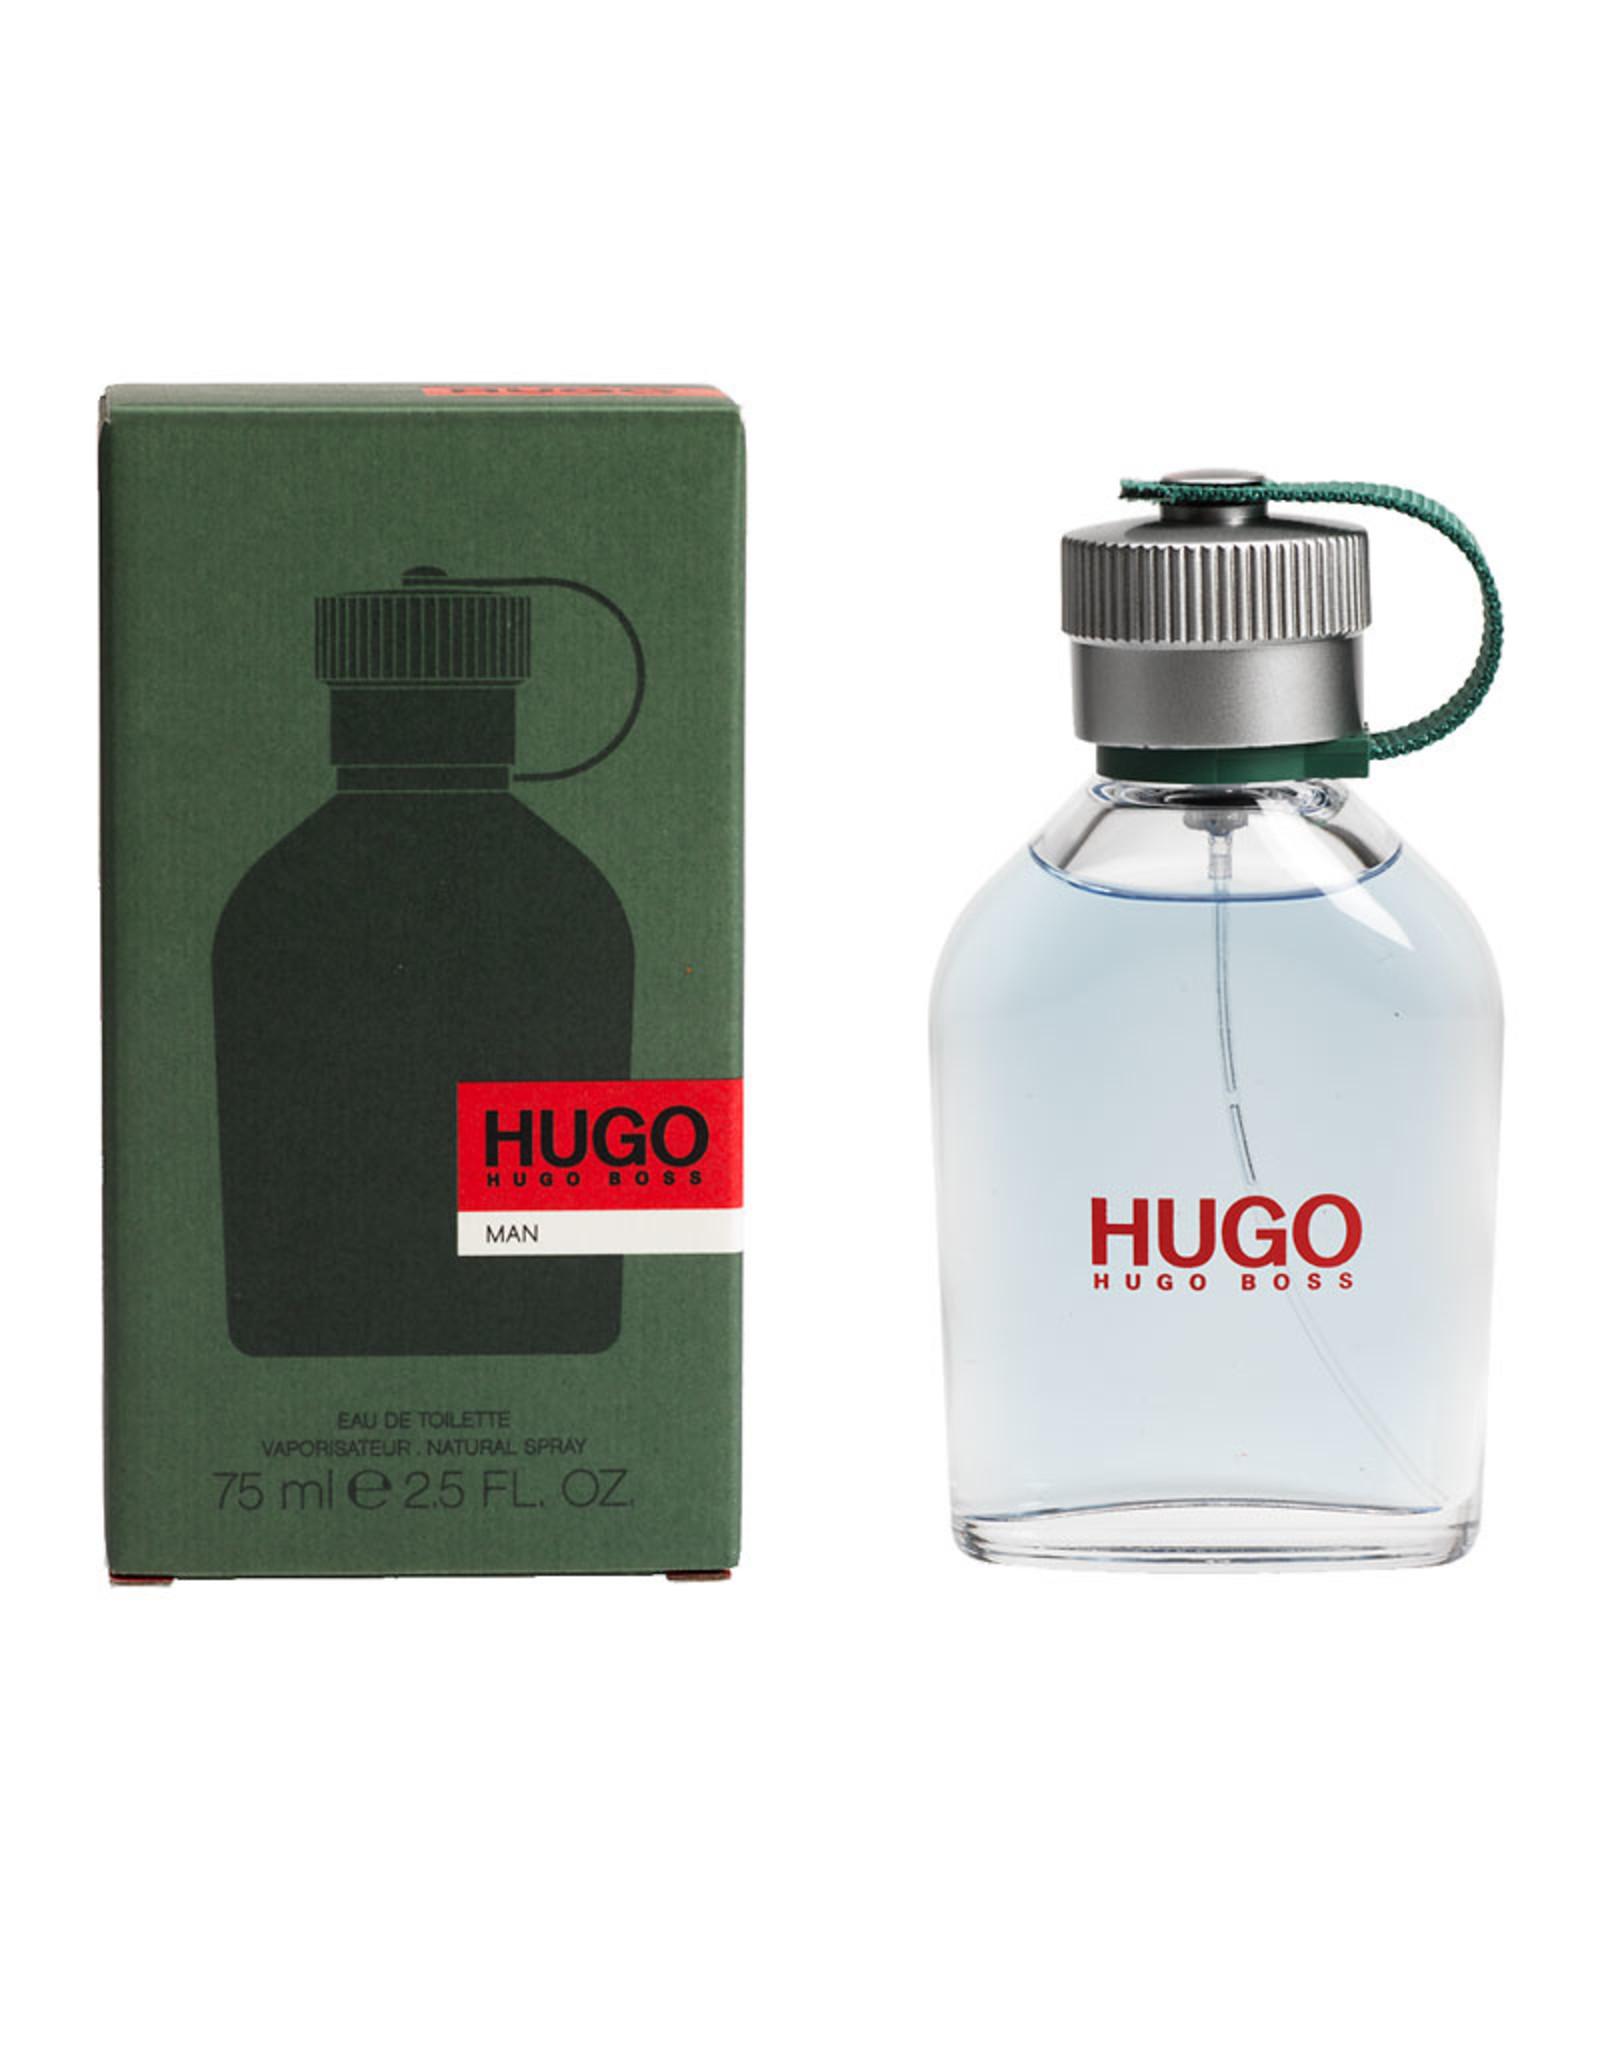 HUGO BOSS HUGO BOSS MAN (GREEN)